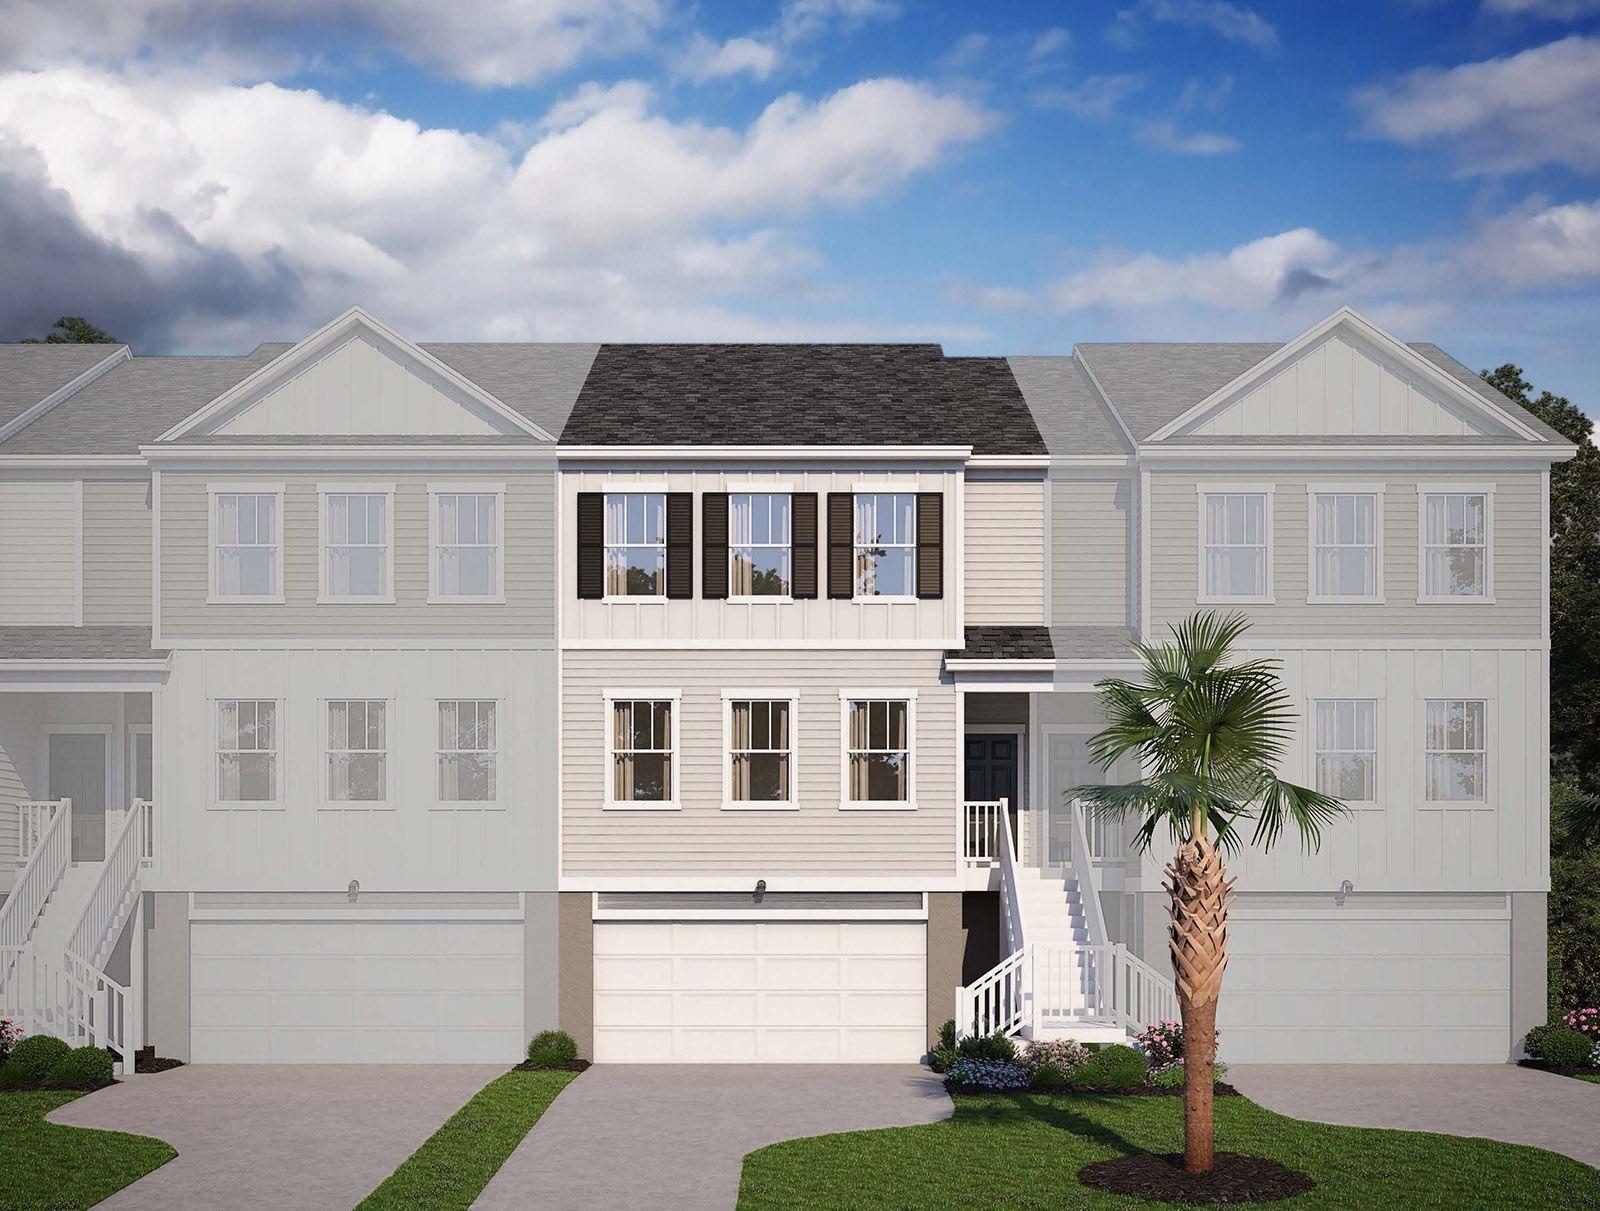 Exterior:305 Lanyard Street, Homesite 22C Elevation Image 1